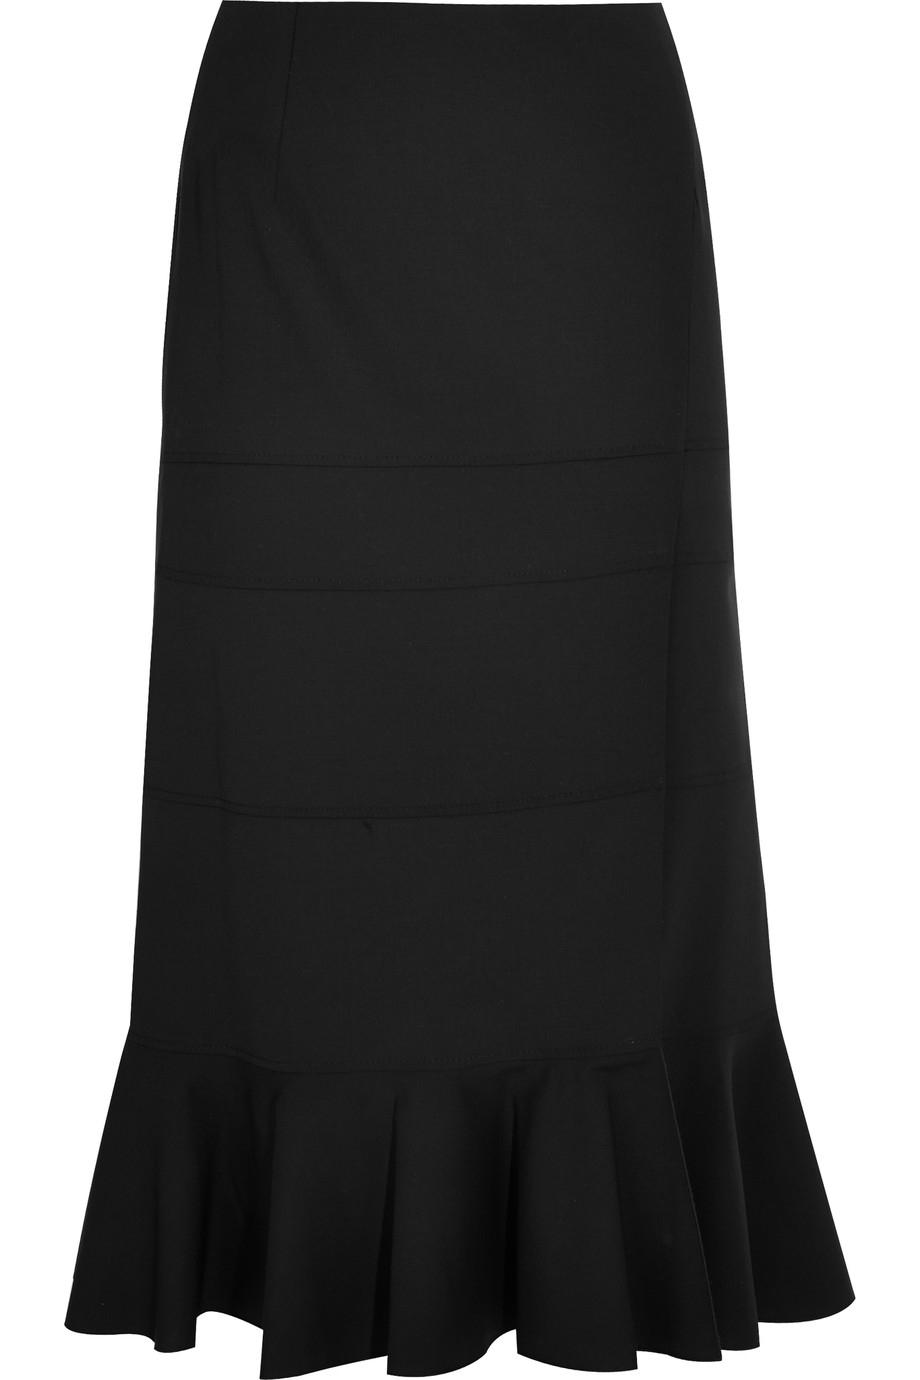 altuzarra faulk stretch wool midi skirt in black save 50